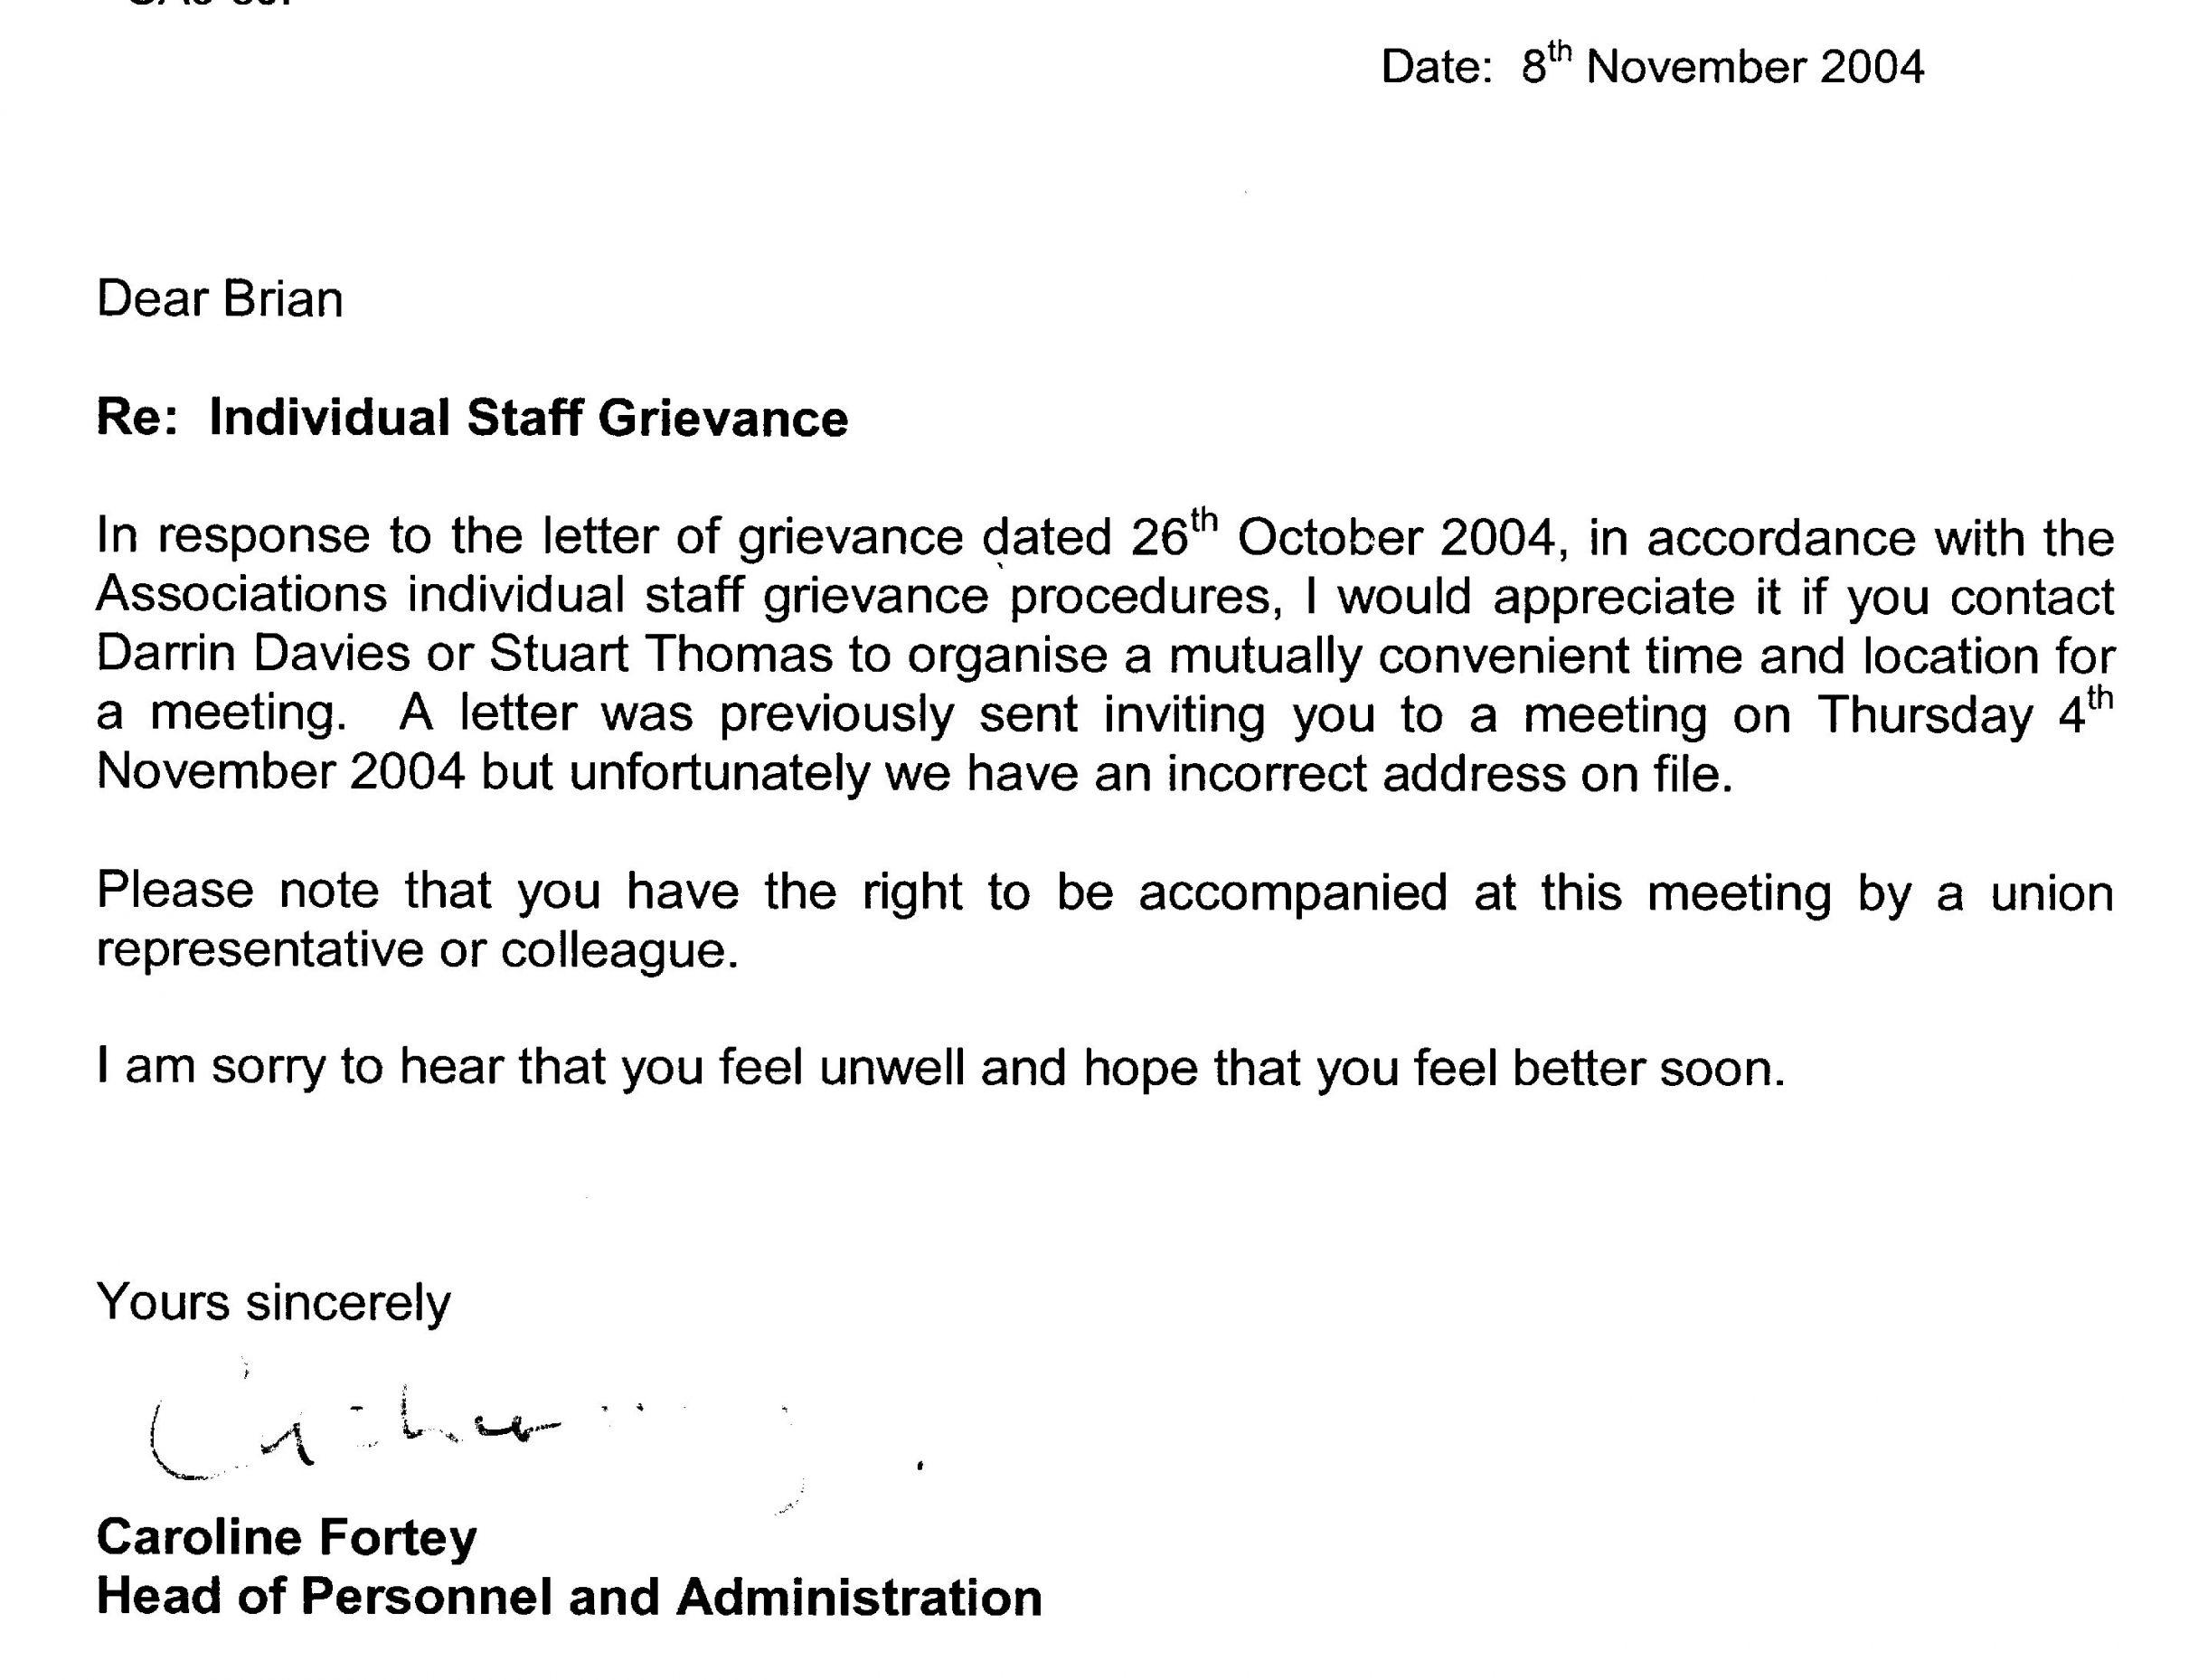 Grievance Response Letter Template in 2020 Letter